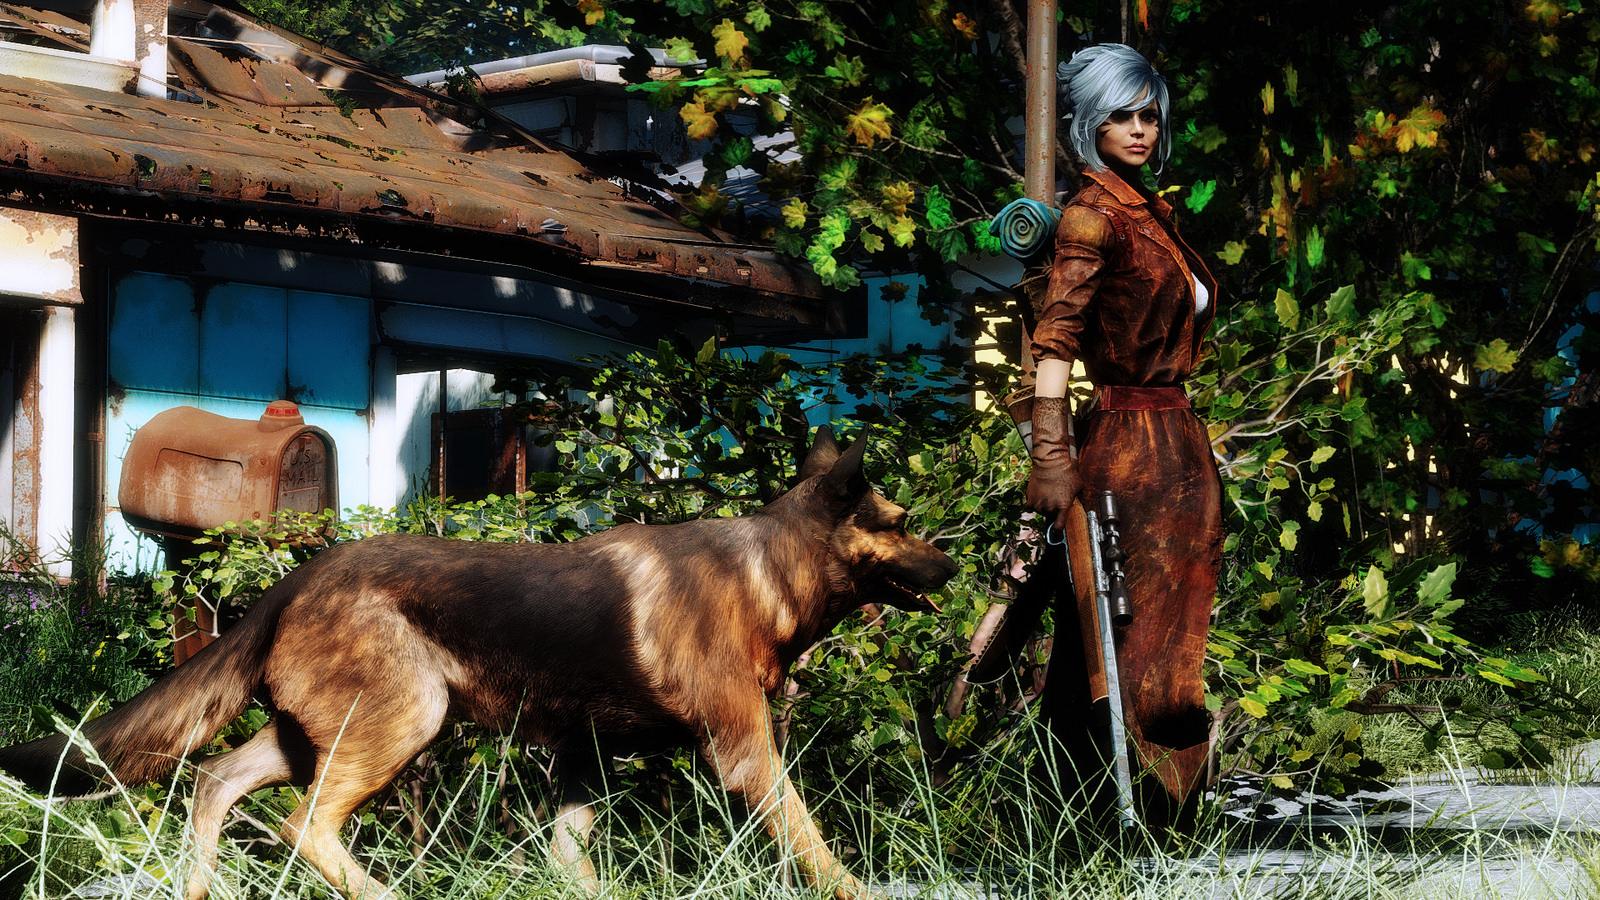 30571500443_9005fd0b1b_h.jpg - Fallout 4